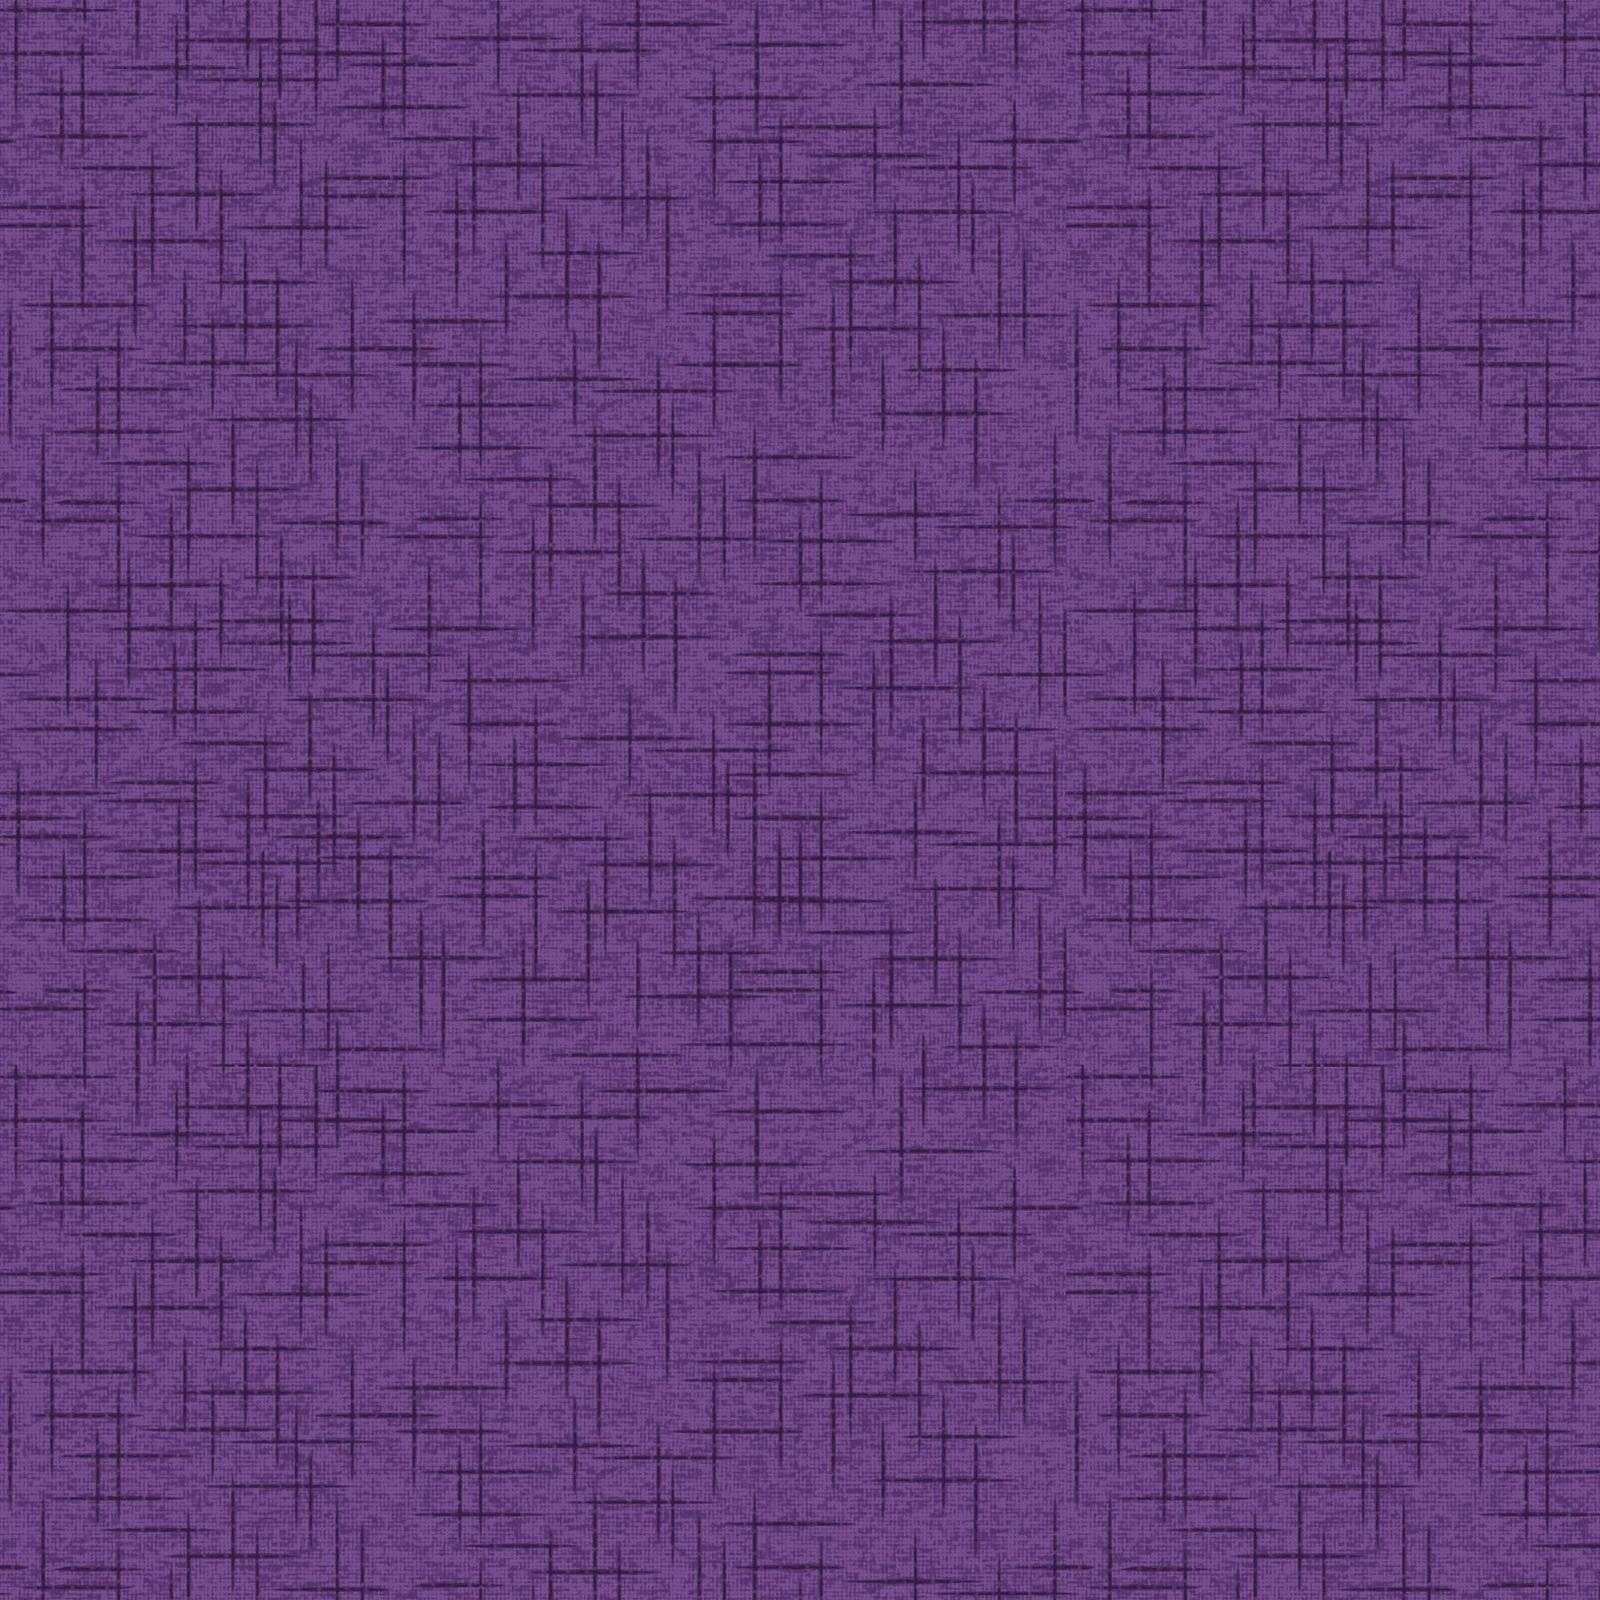 Crosshatch - Purple<br/>Maywood Studio 9399-V